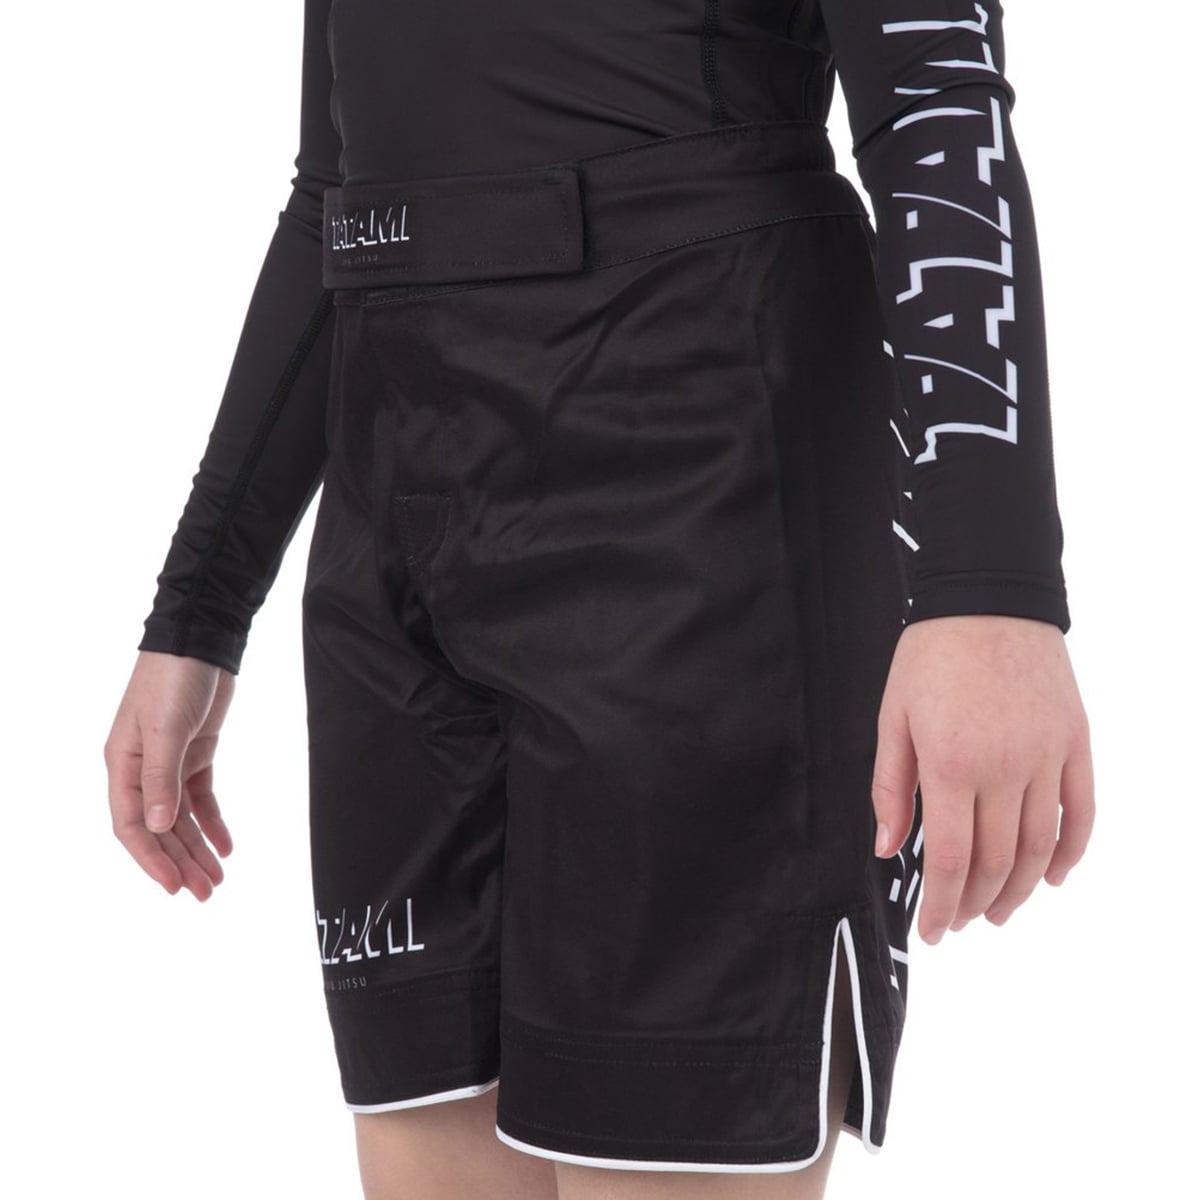 Black Tatami Fightwear Kids Shadow No Gi Shorts